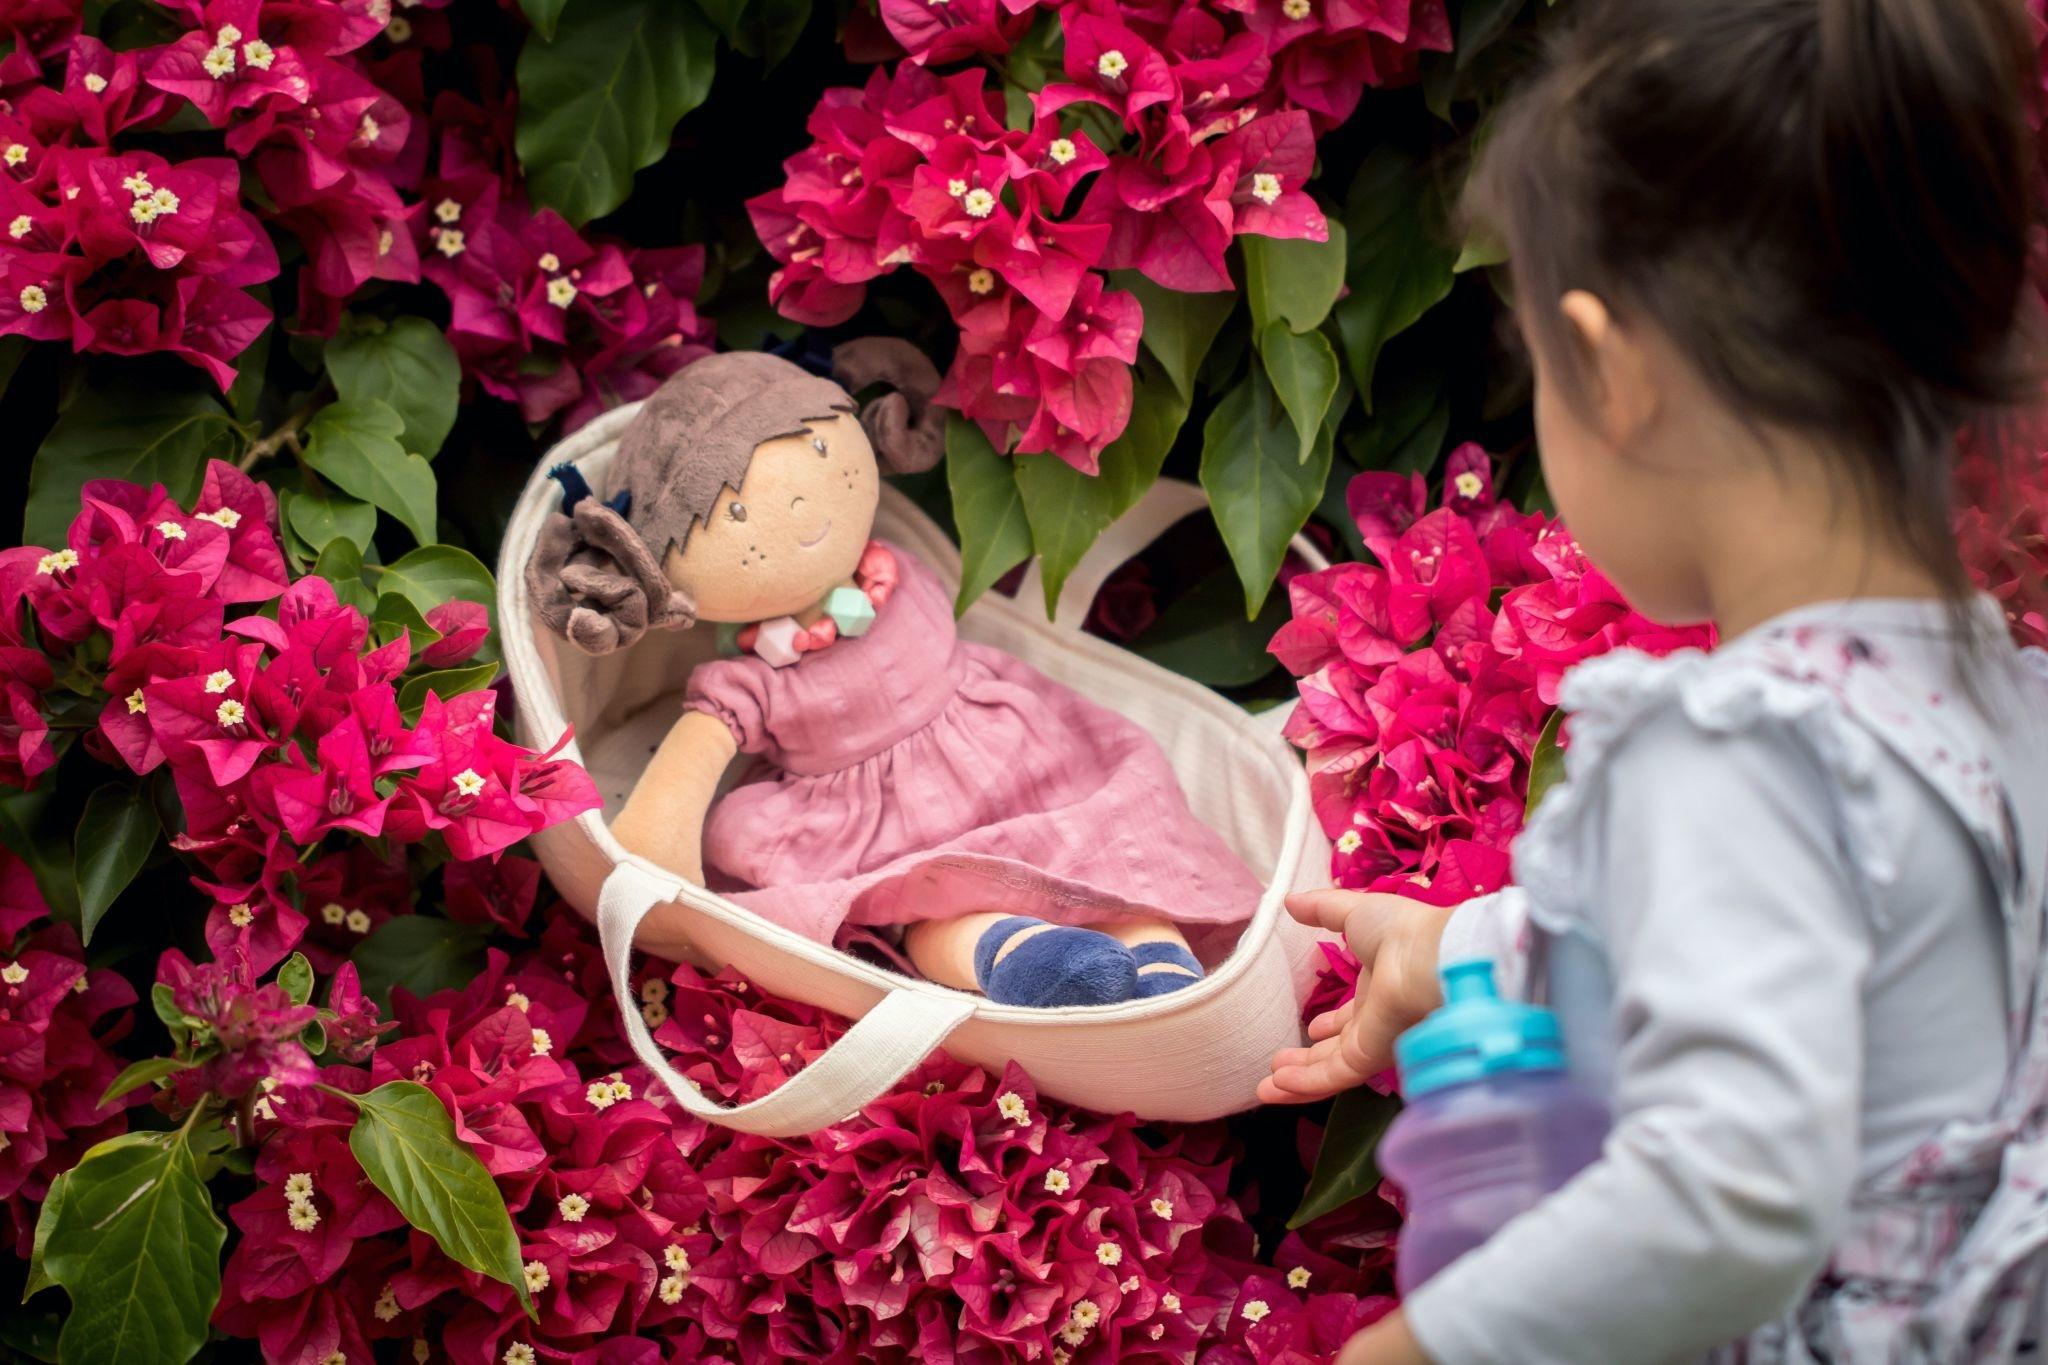 Tikiri Toys Mandy Doll with Friendship Bracelet